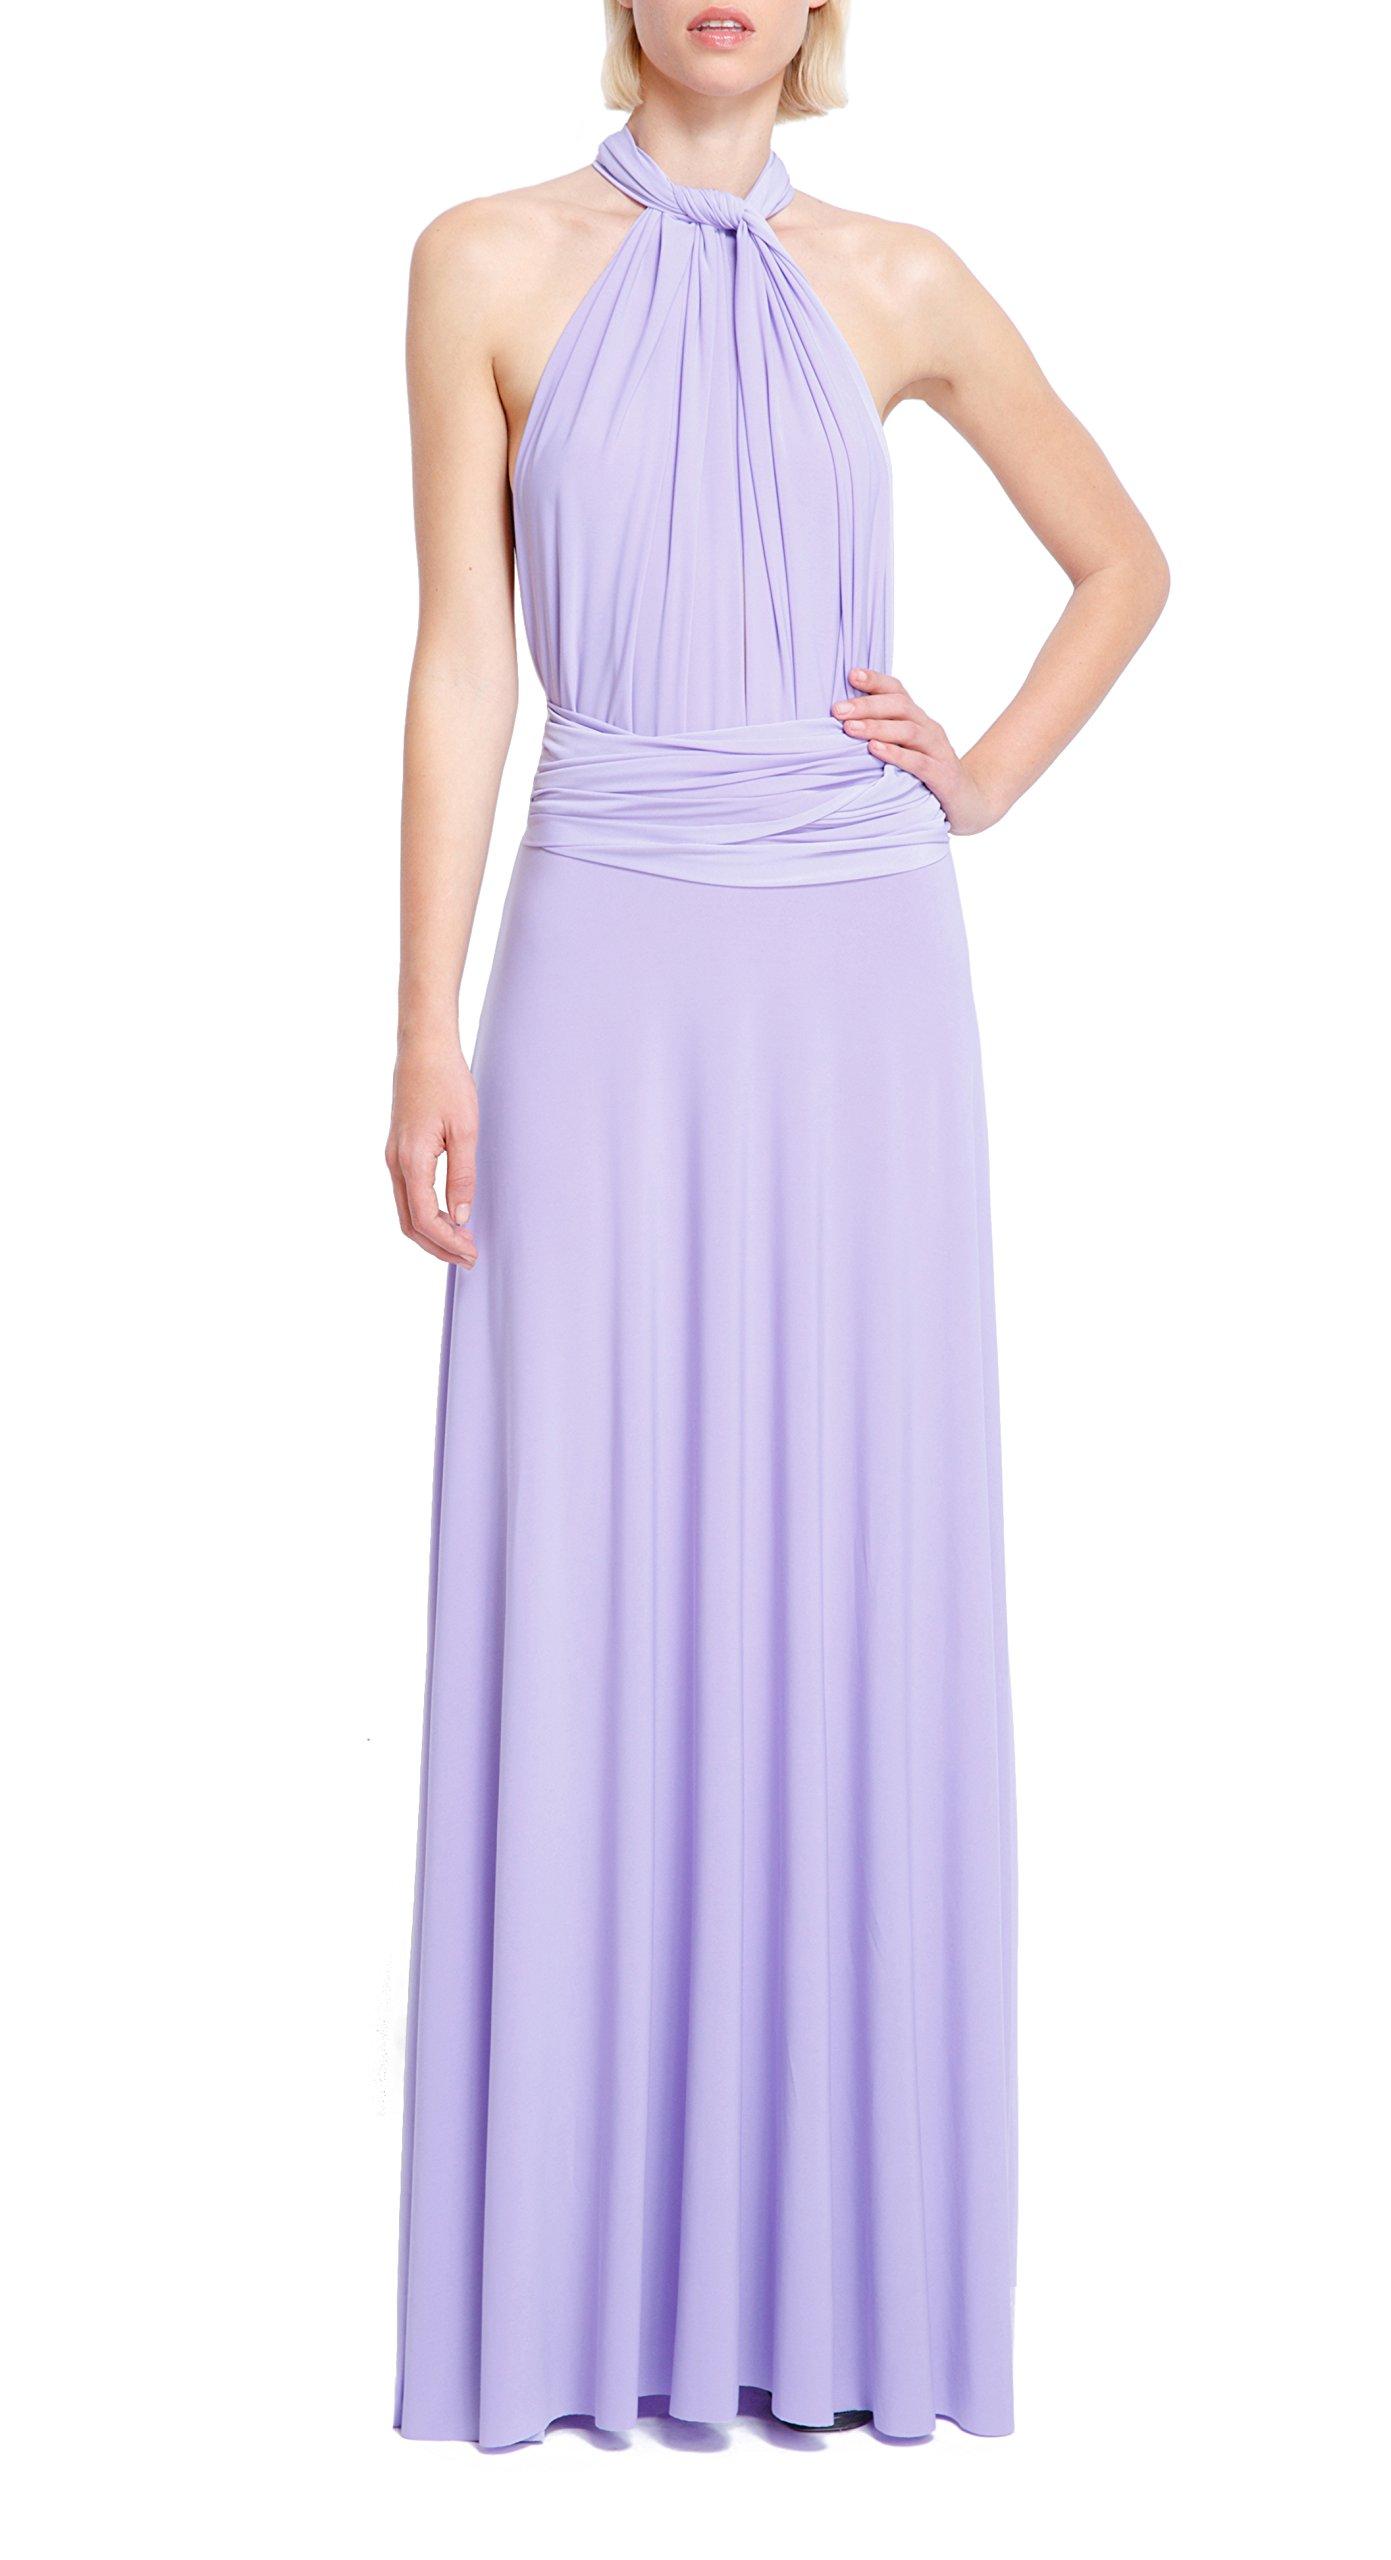 Available at Amazon: VonVonni Women's Transformer DressLilacOne Size Fits USA 2-10